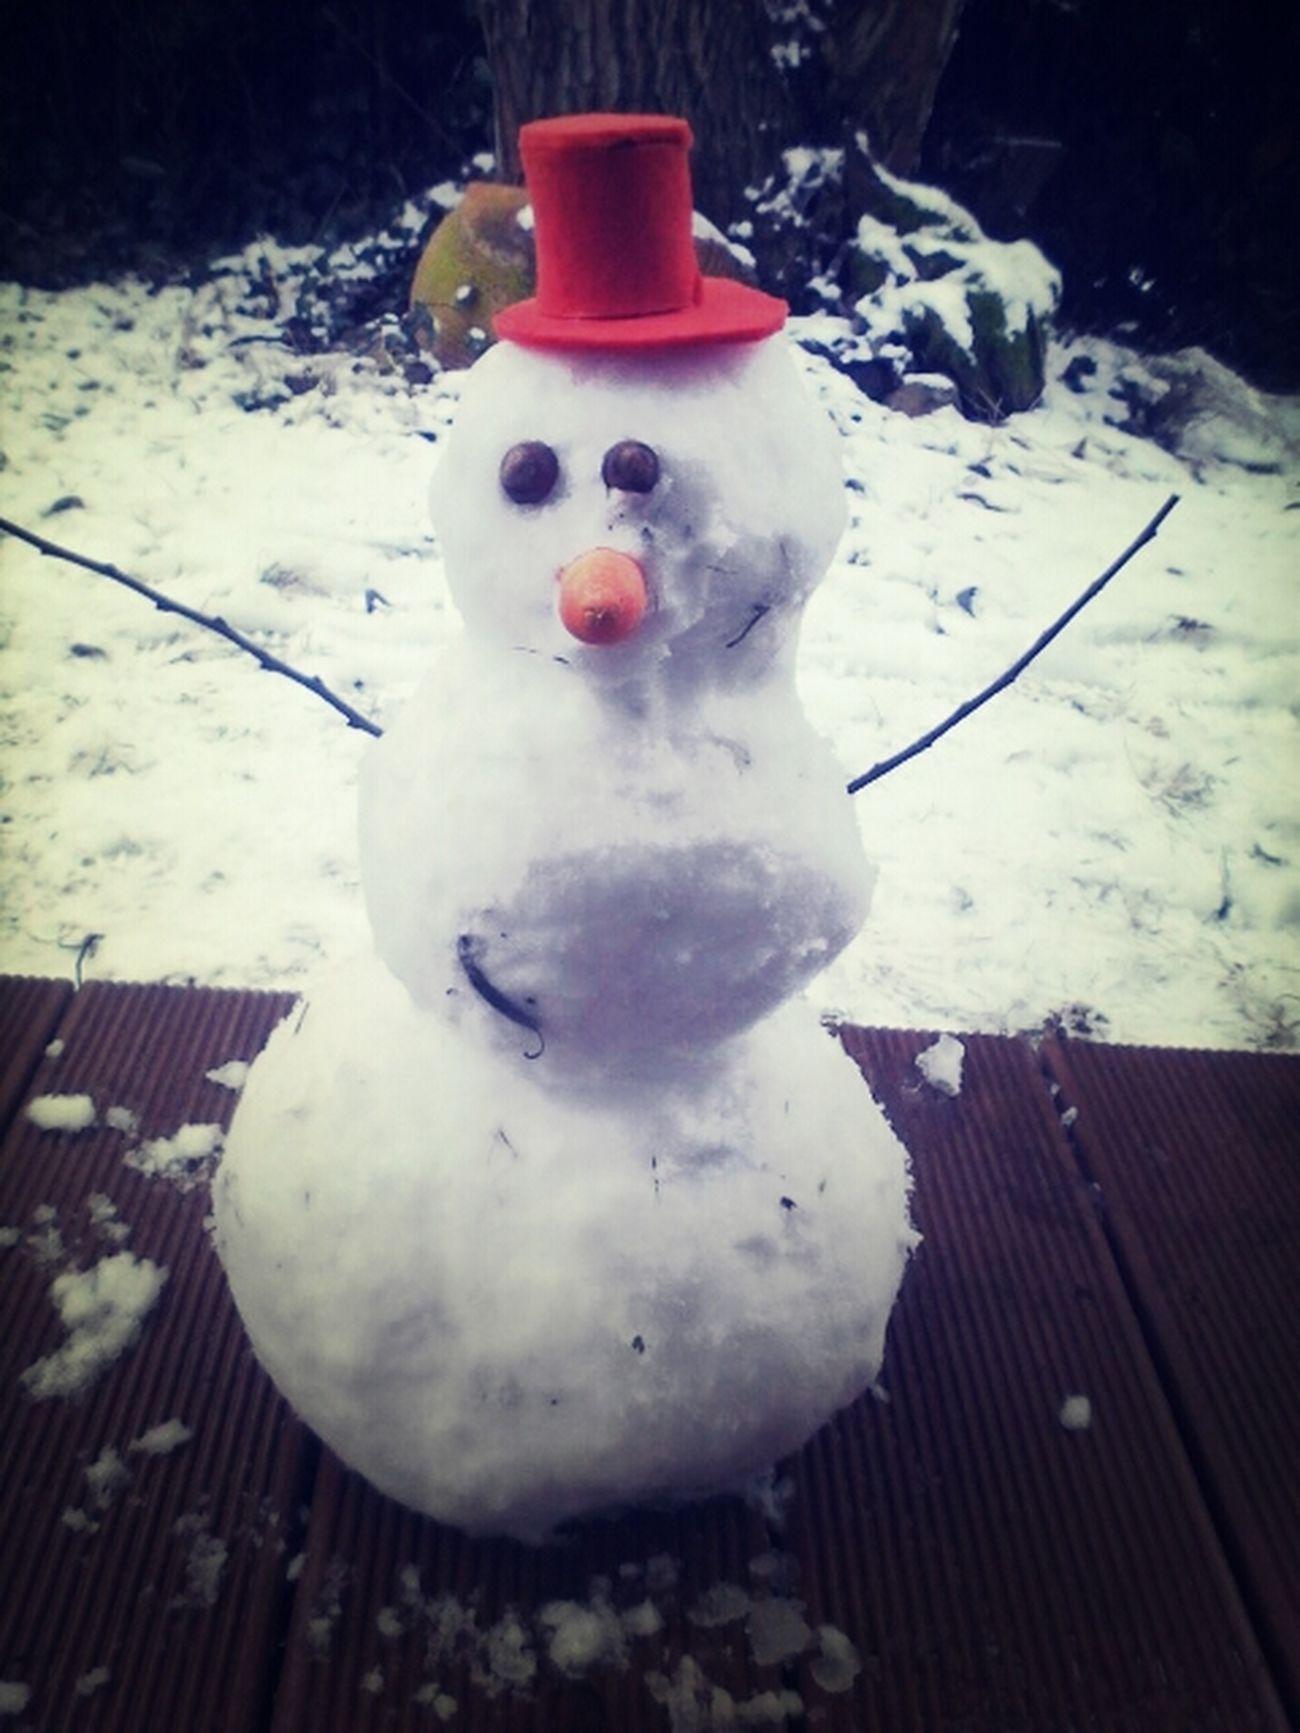 Snowman Snowman Snowman:) Snowman⛄ Snowman...